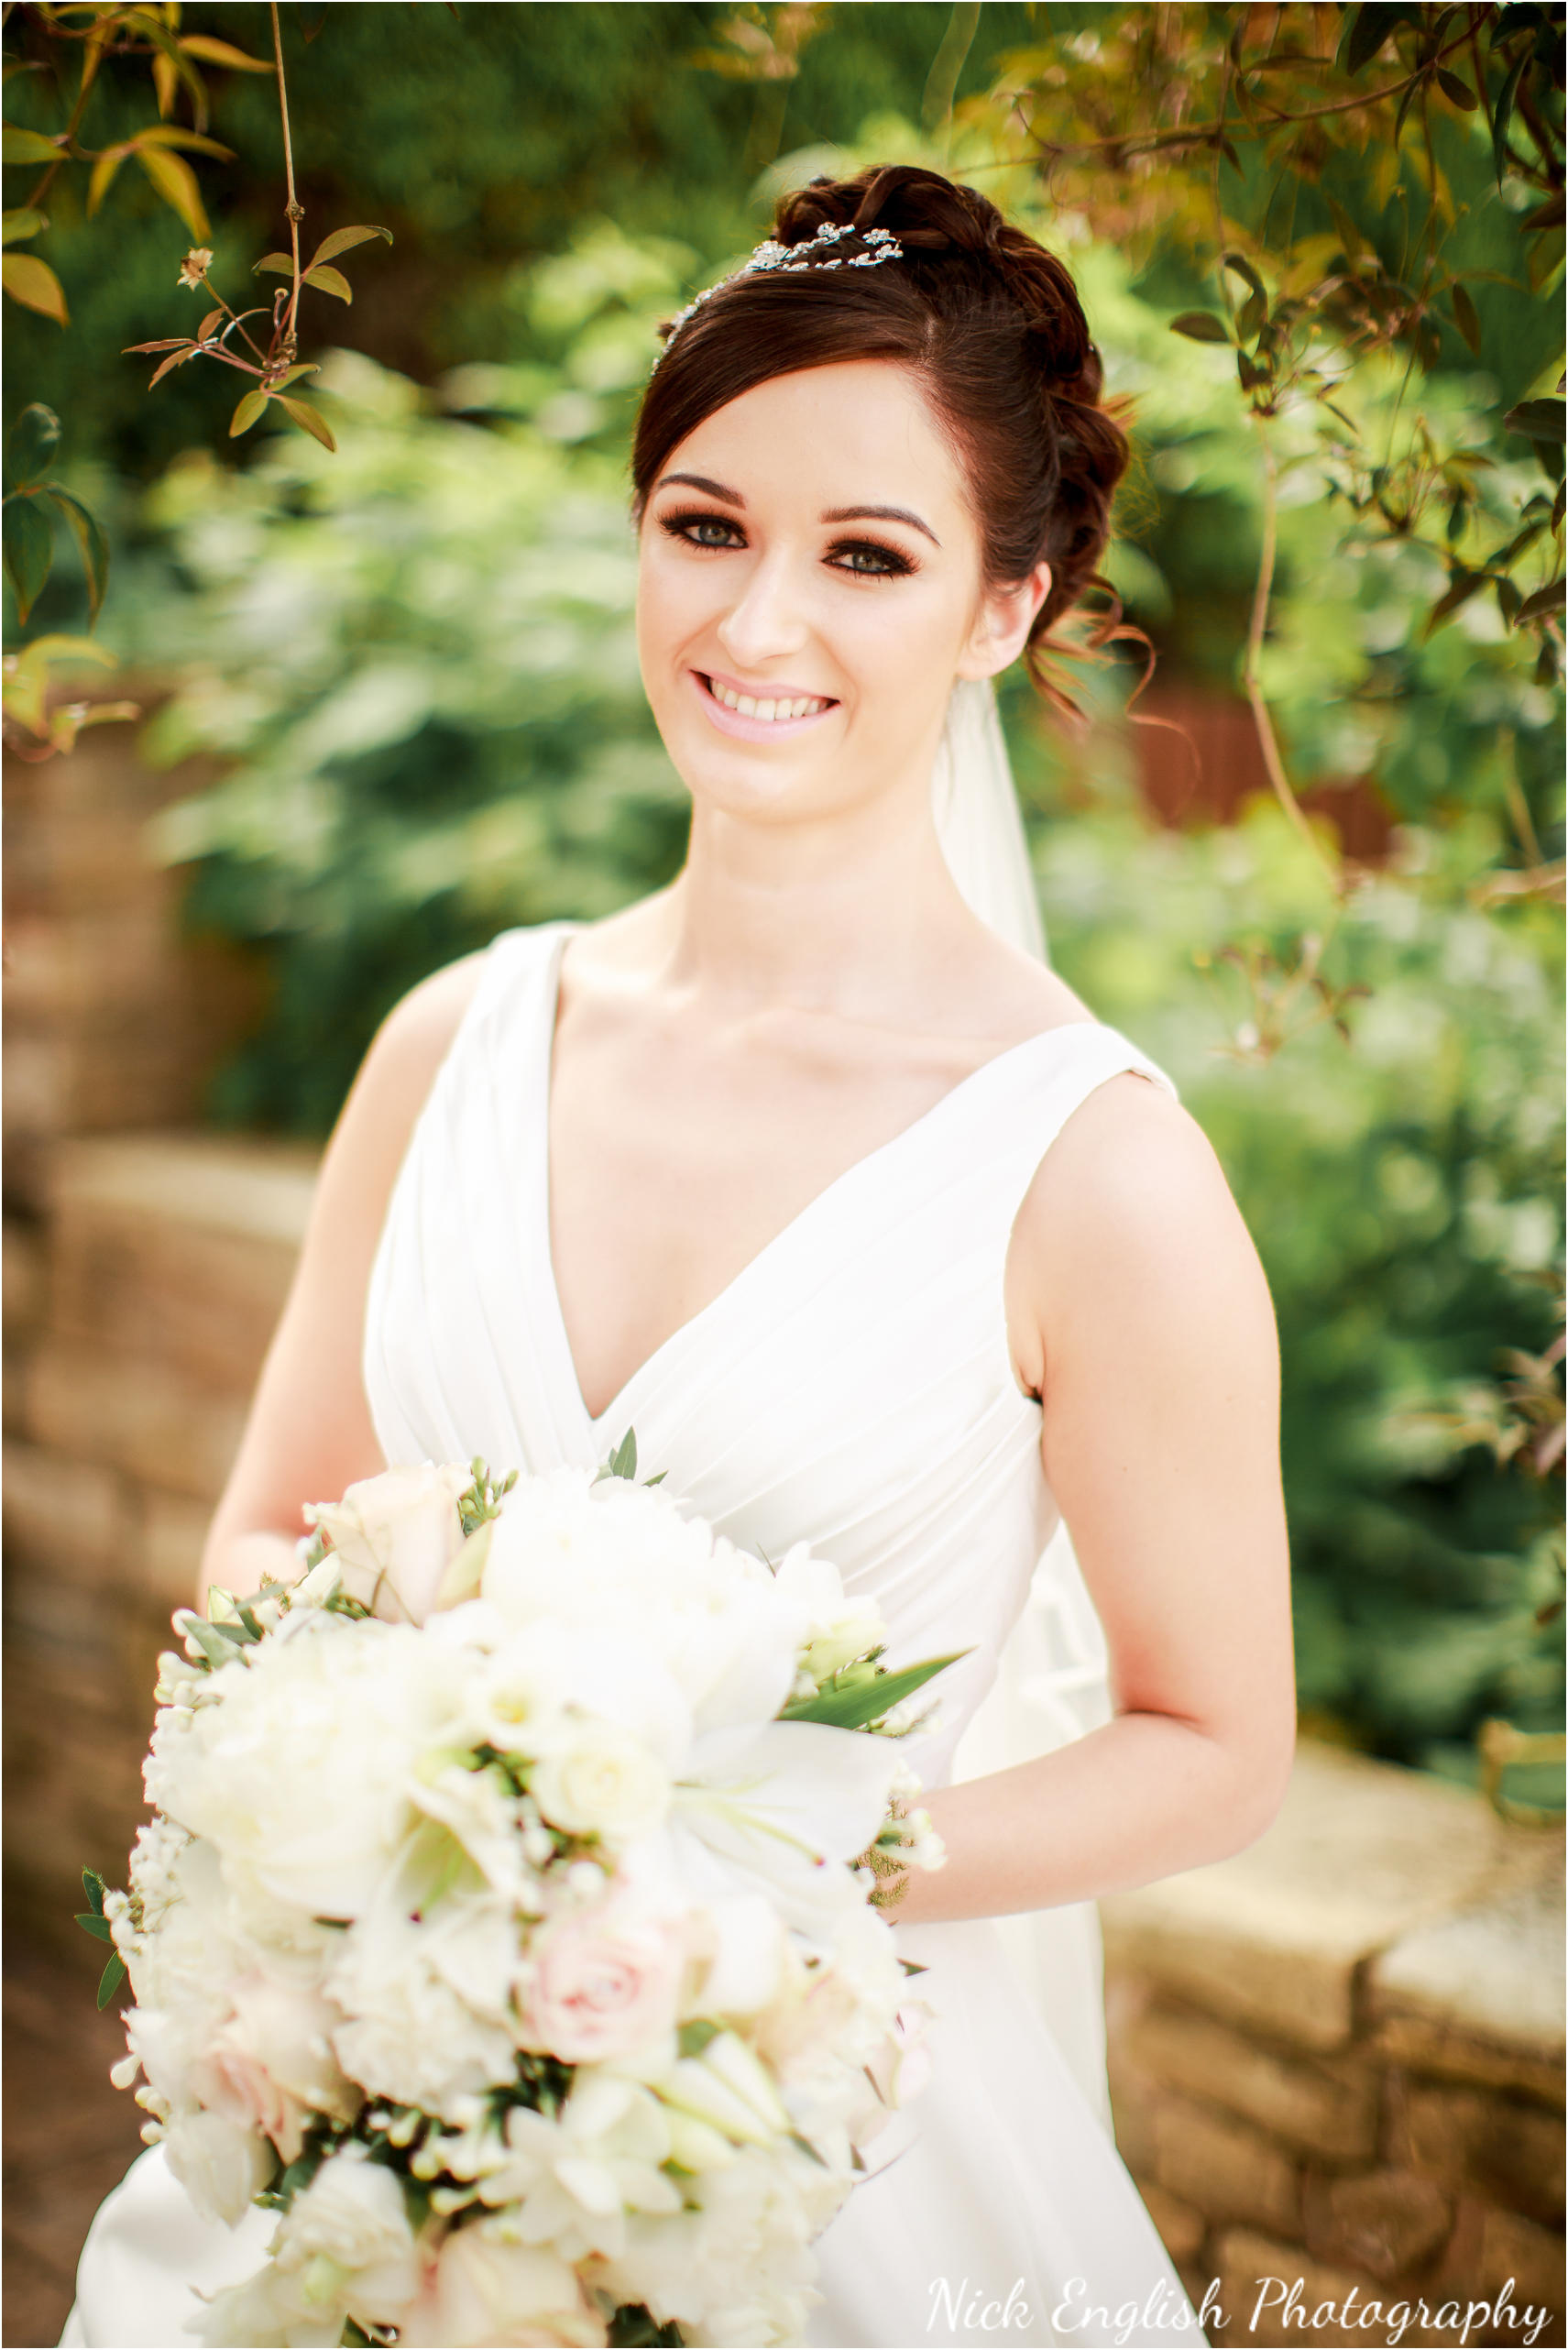 Emily David Wedding Photographs at Barton Grange Preston by Nick English Photography 41jpg.jpeg